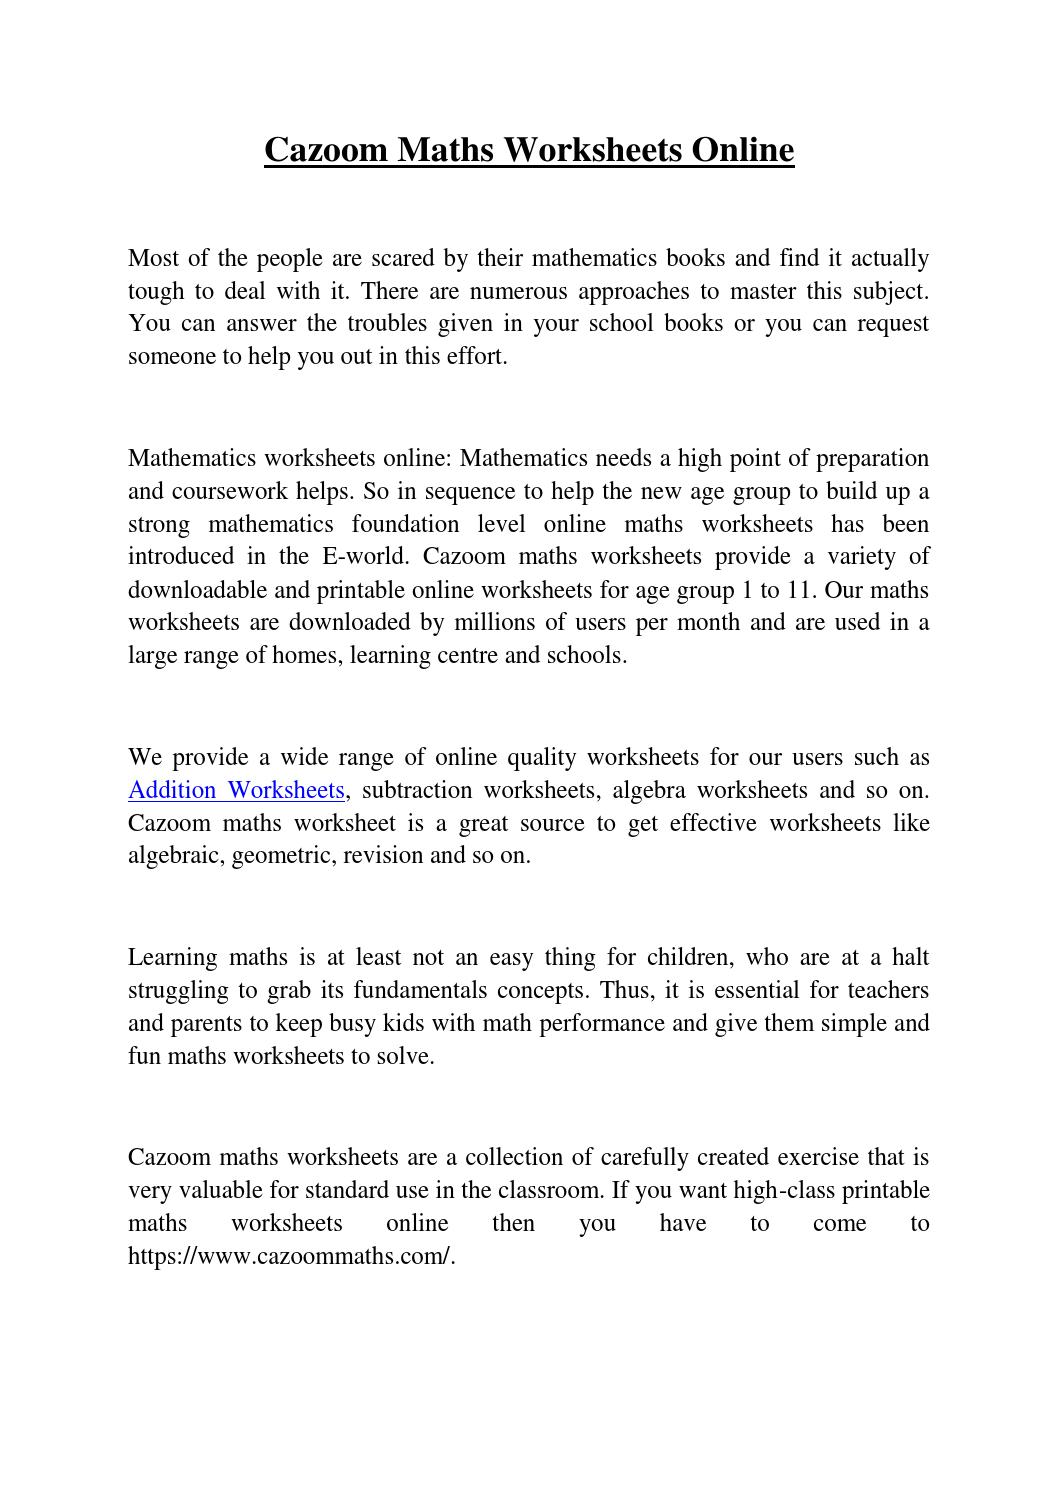 Cazoom-Math Worksheets by markdisuja00 - issuu